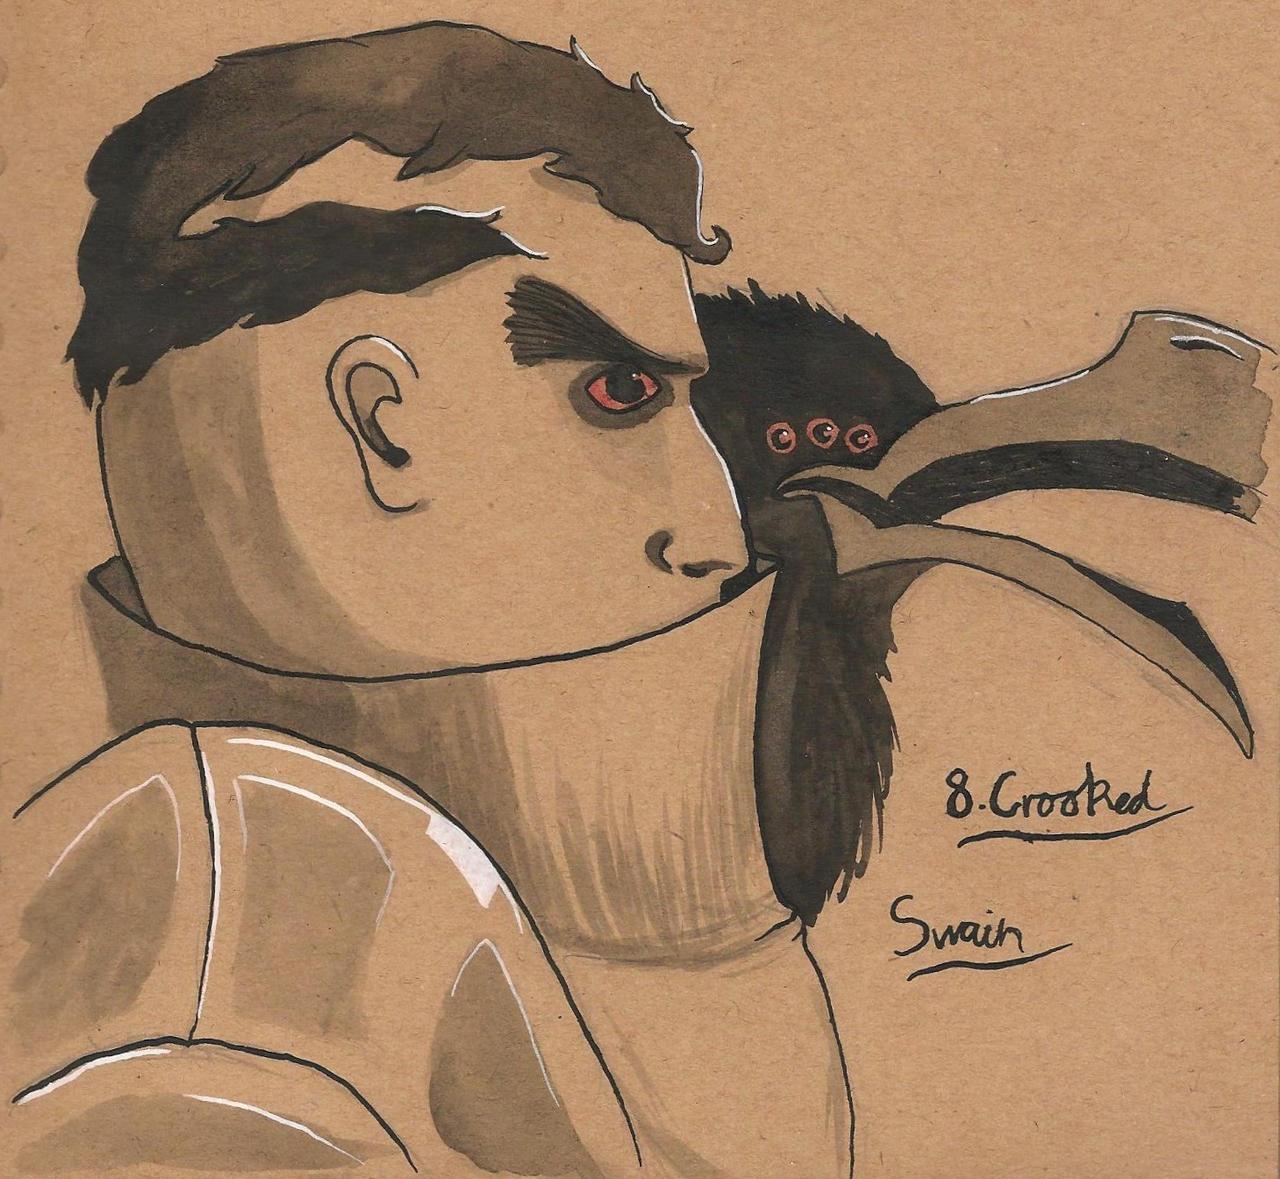 8. Crooked - Swain